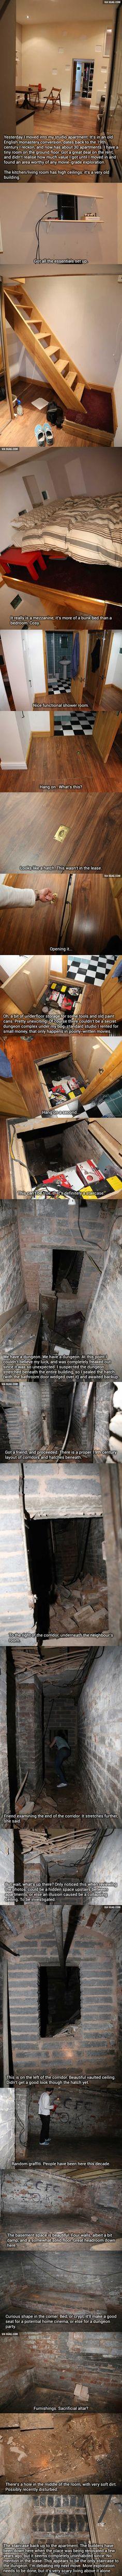 Secret dungeon ~sooo wish my house had that